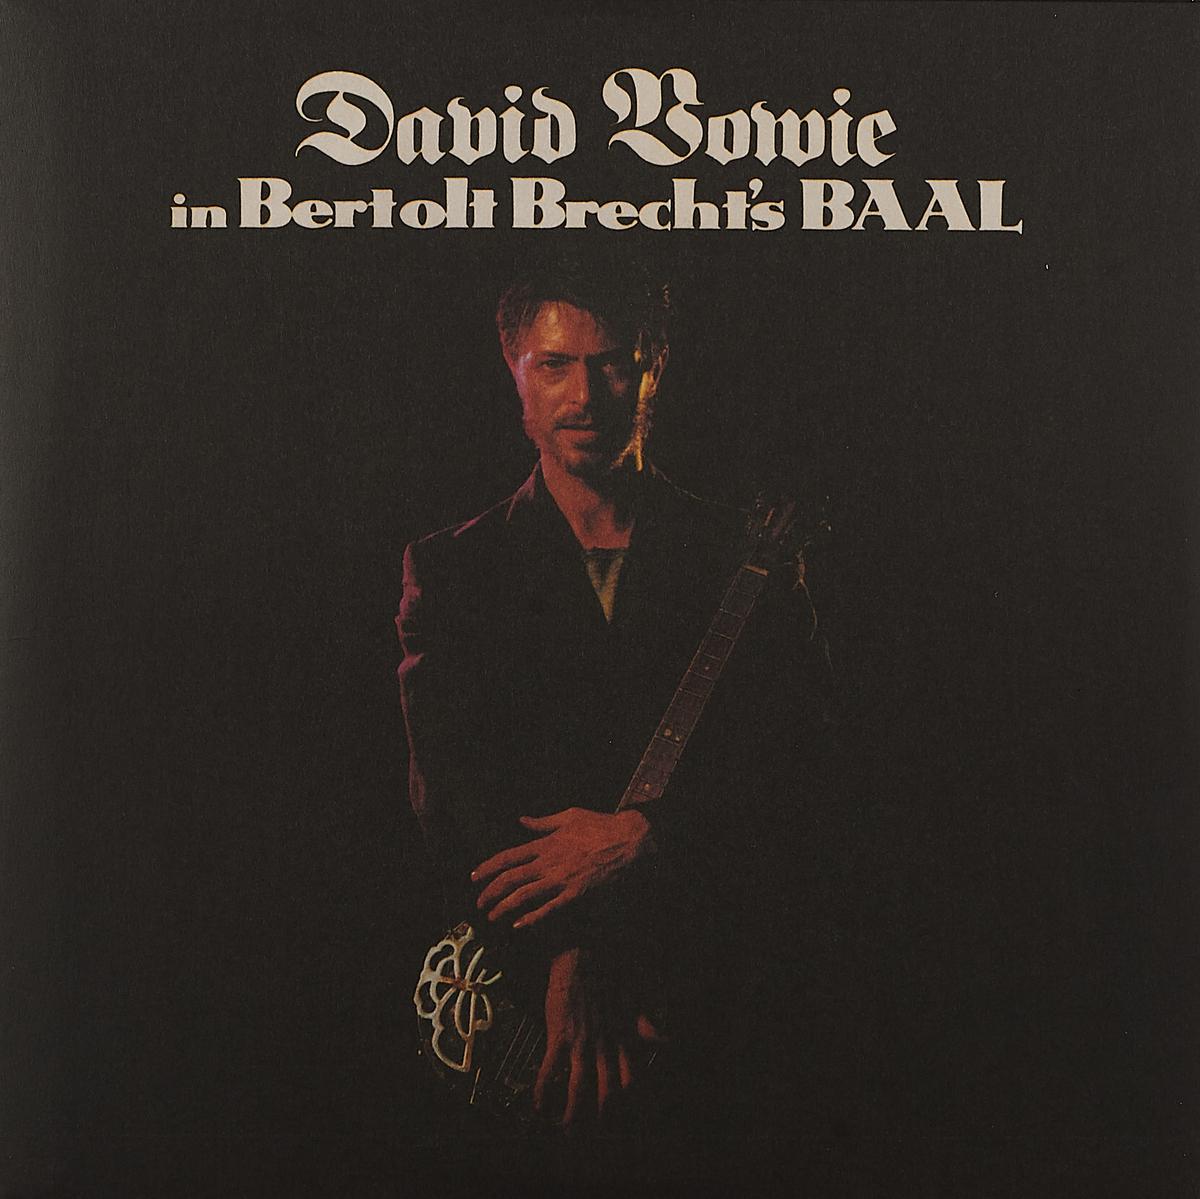 Дэвид Боуи David Bowie. David Bowie In Bertolt Brecht's Baal (LP) дэвид боуи david bowie the document cd dvd